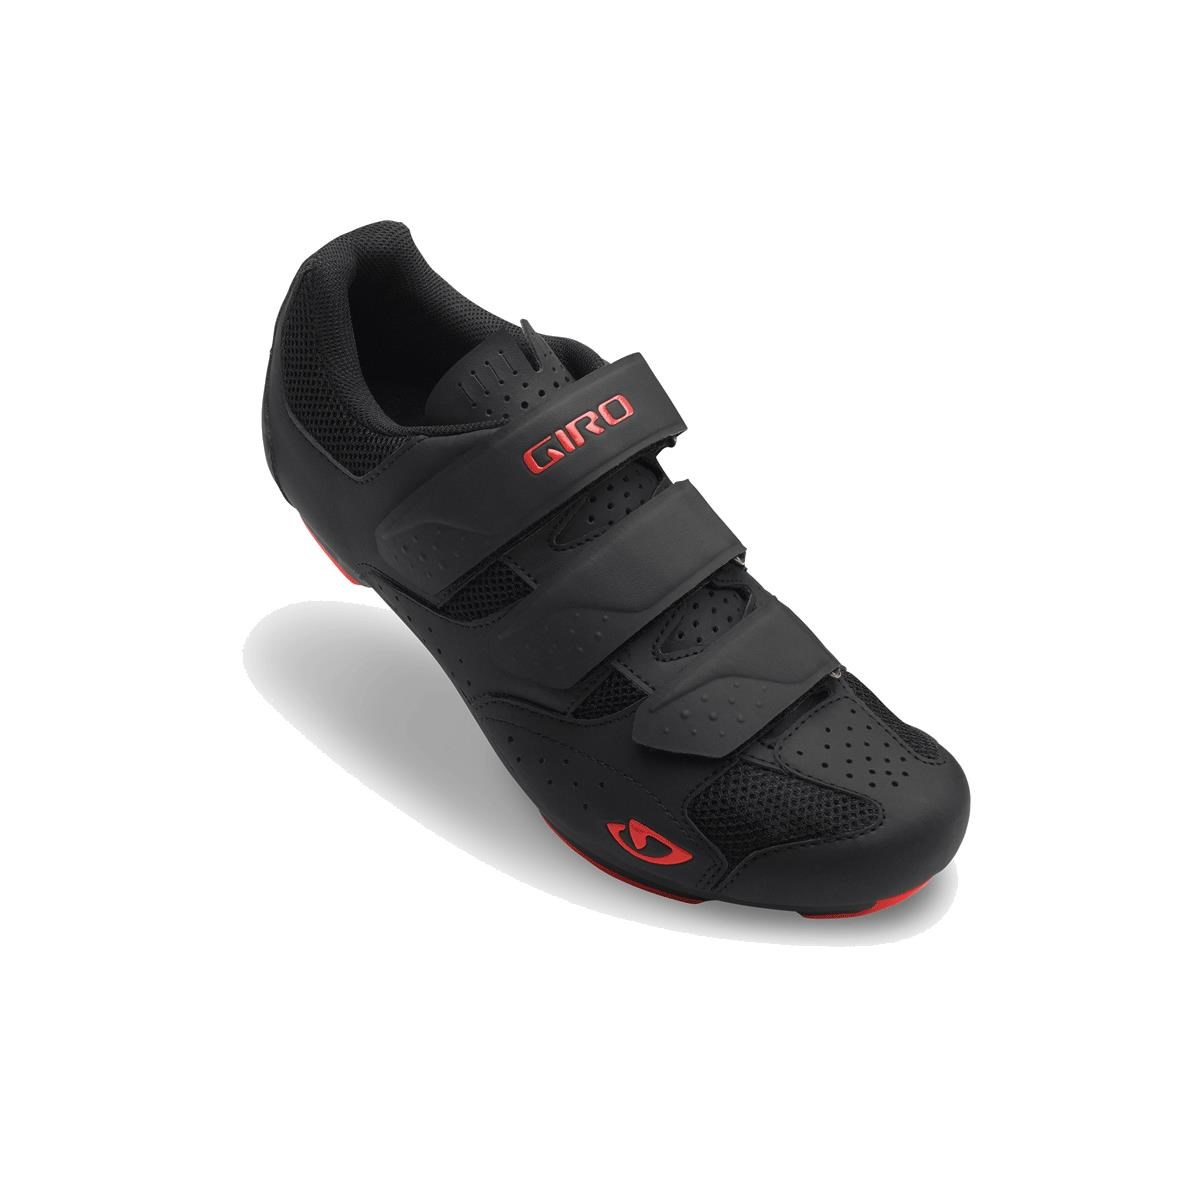 Rev Road Cycling Shoes